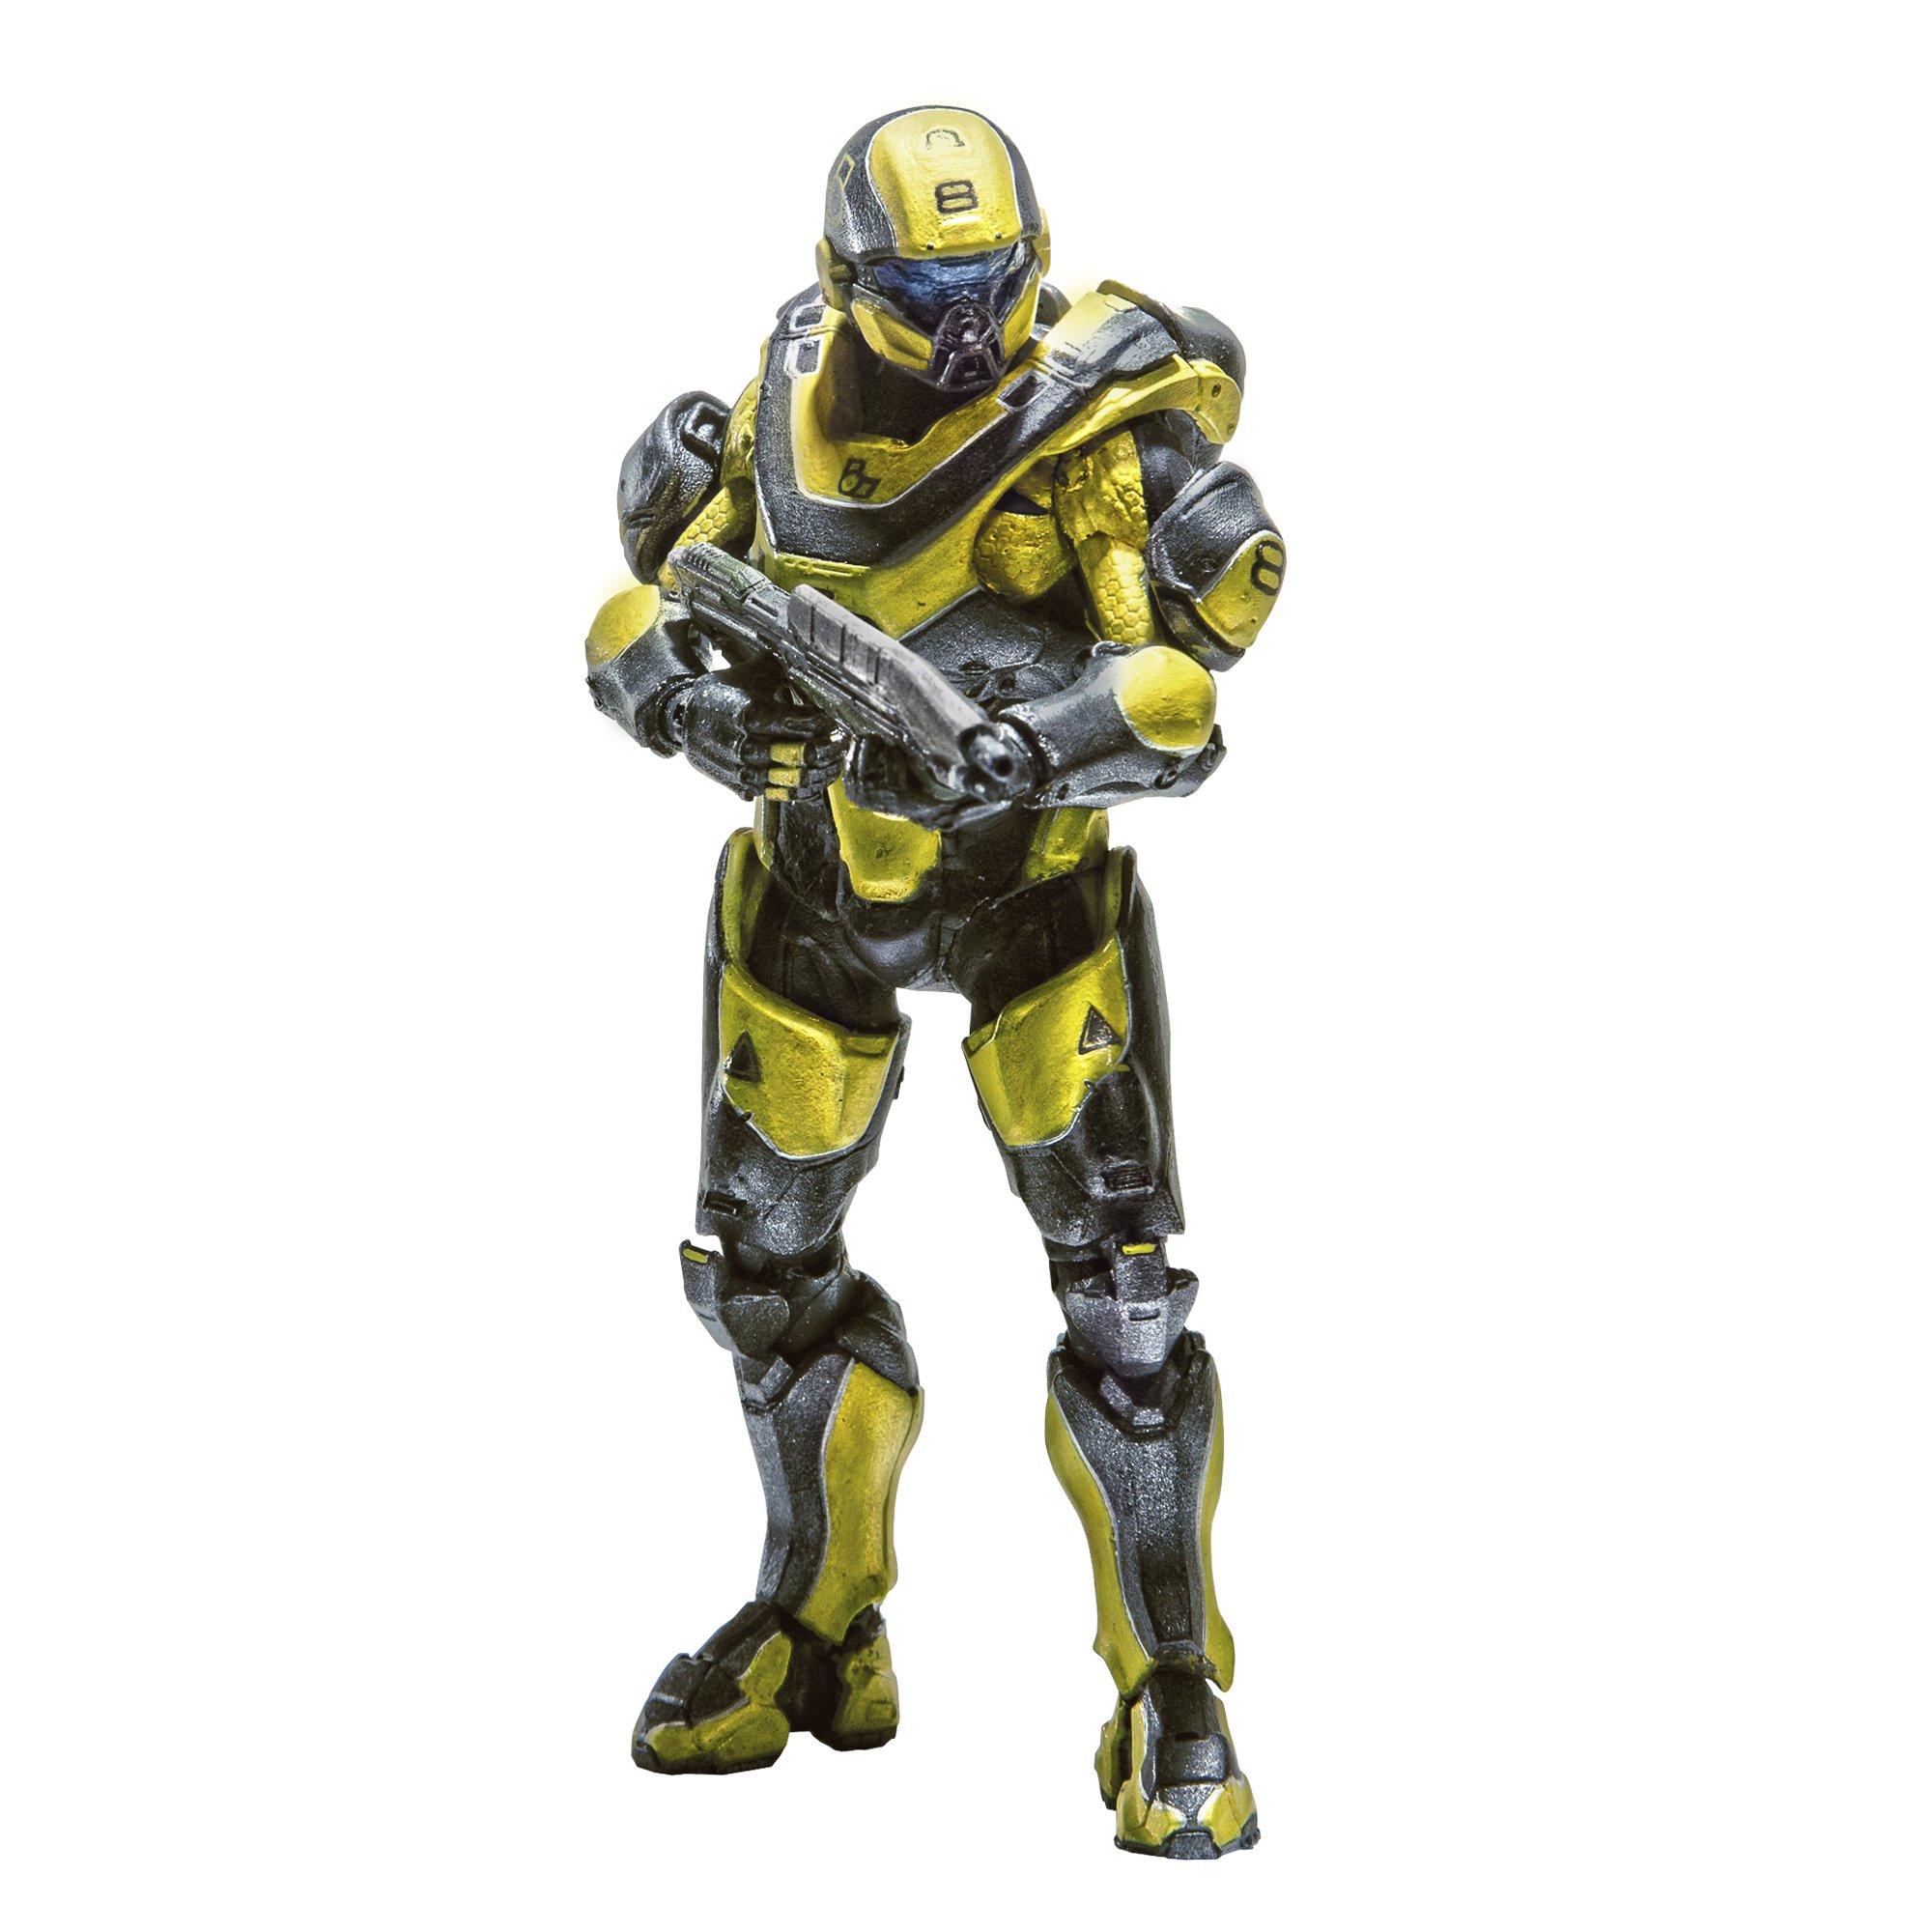 Mcfarlane Halo 5  Guardians Series 1 Spartan Athlon Action